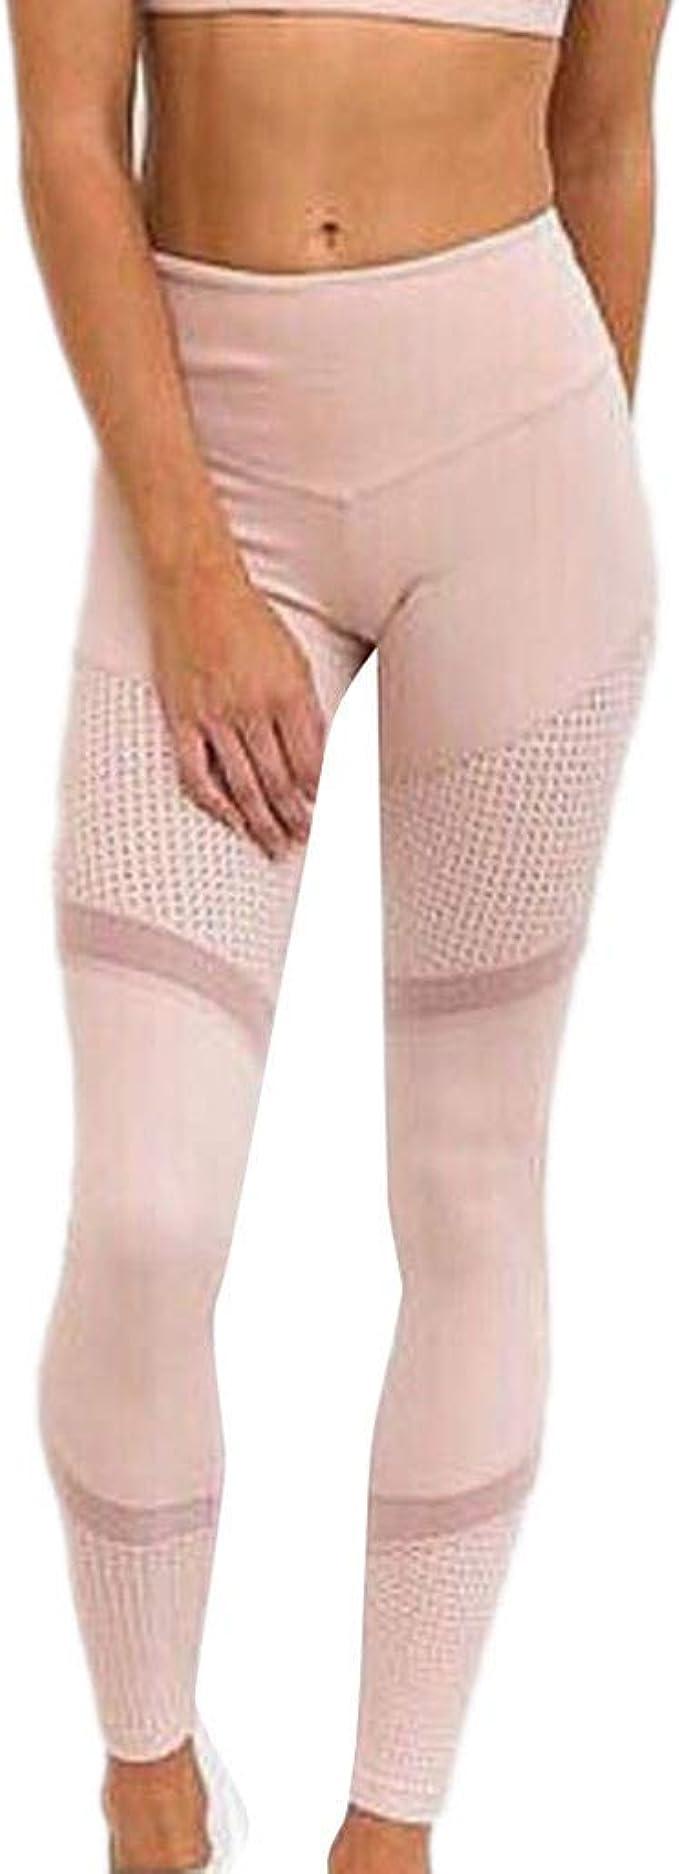 Dorical Leggings Taille Haute Solides Femmes Yoga Pantalons Leggins en Cuir maill/é Pantalon de Yoga Slim Skinny Running Jogging Pants Maille Respirant Fitness Trouser Mode Casual Sport